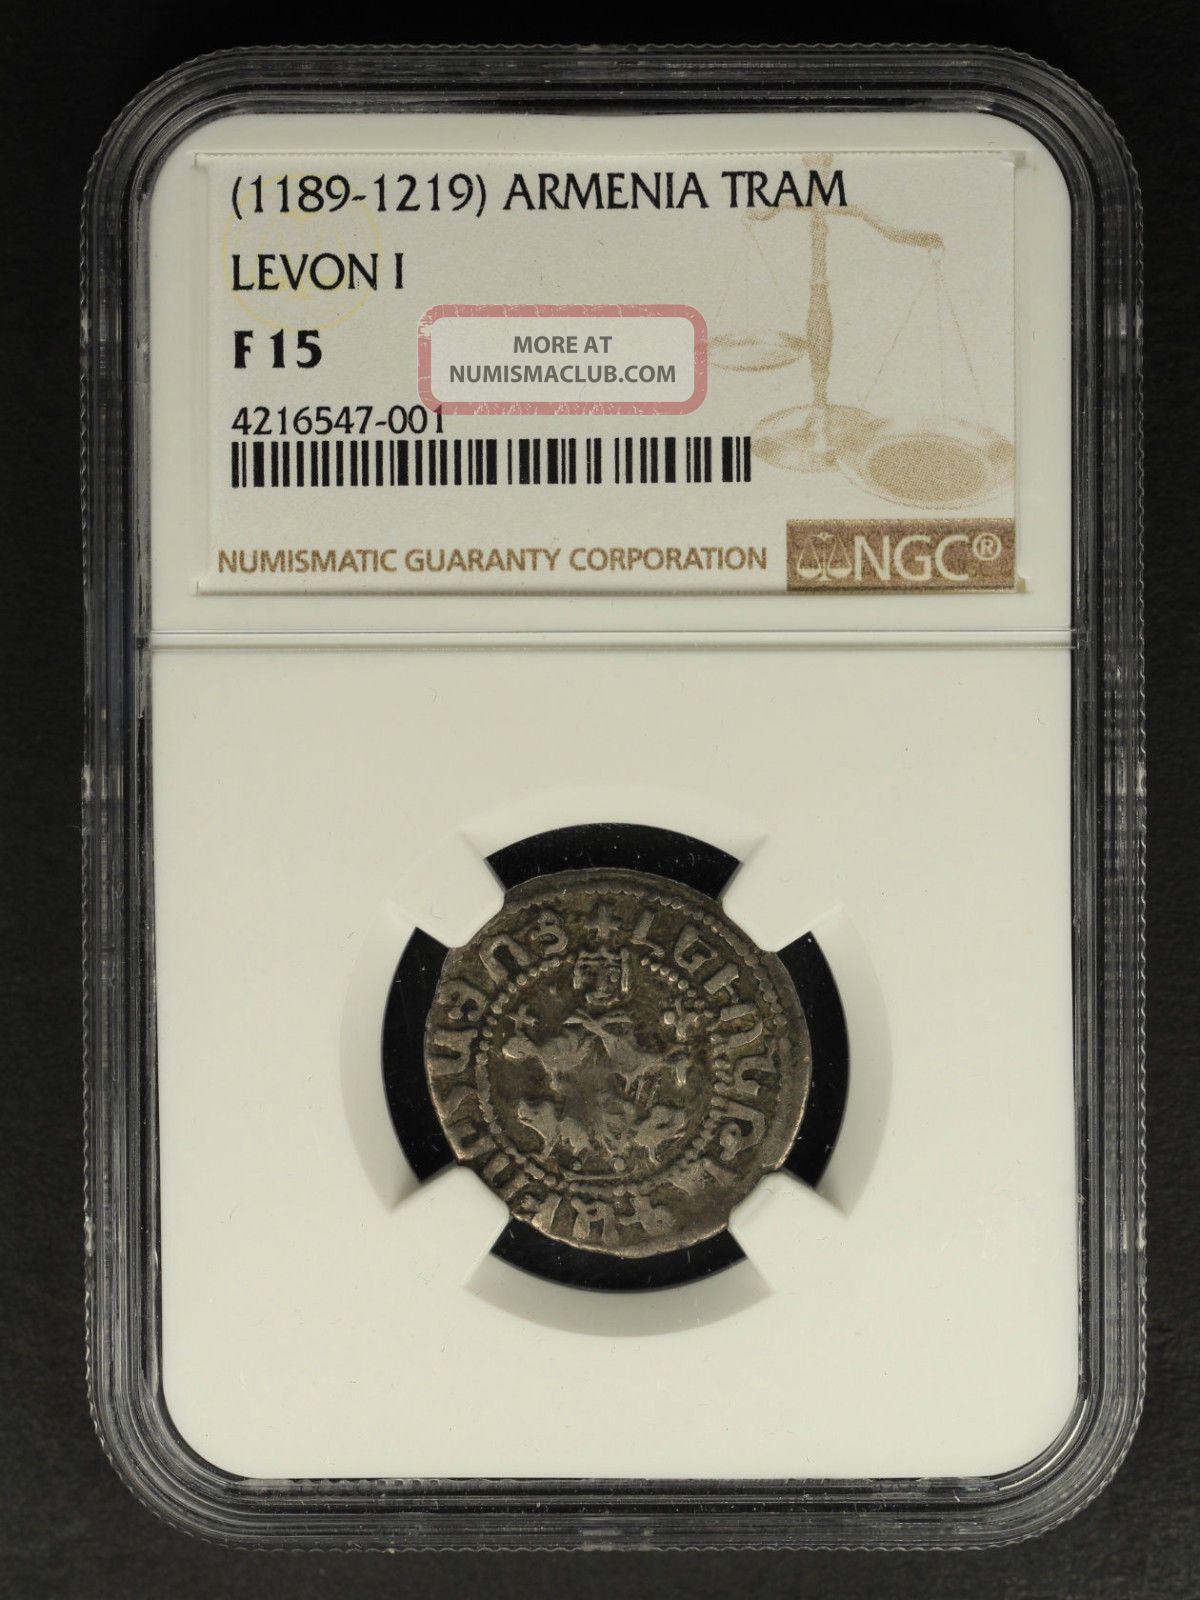 (1189 - 1219) Armenia Silver Tram Levon I Ngc F - 15 - 160453 Coins: Ancient photo